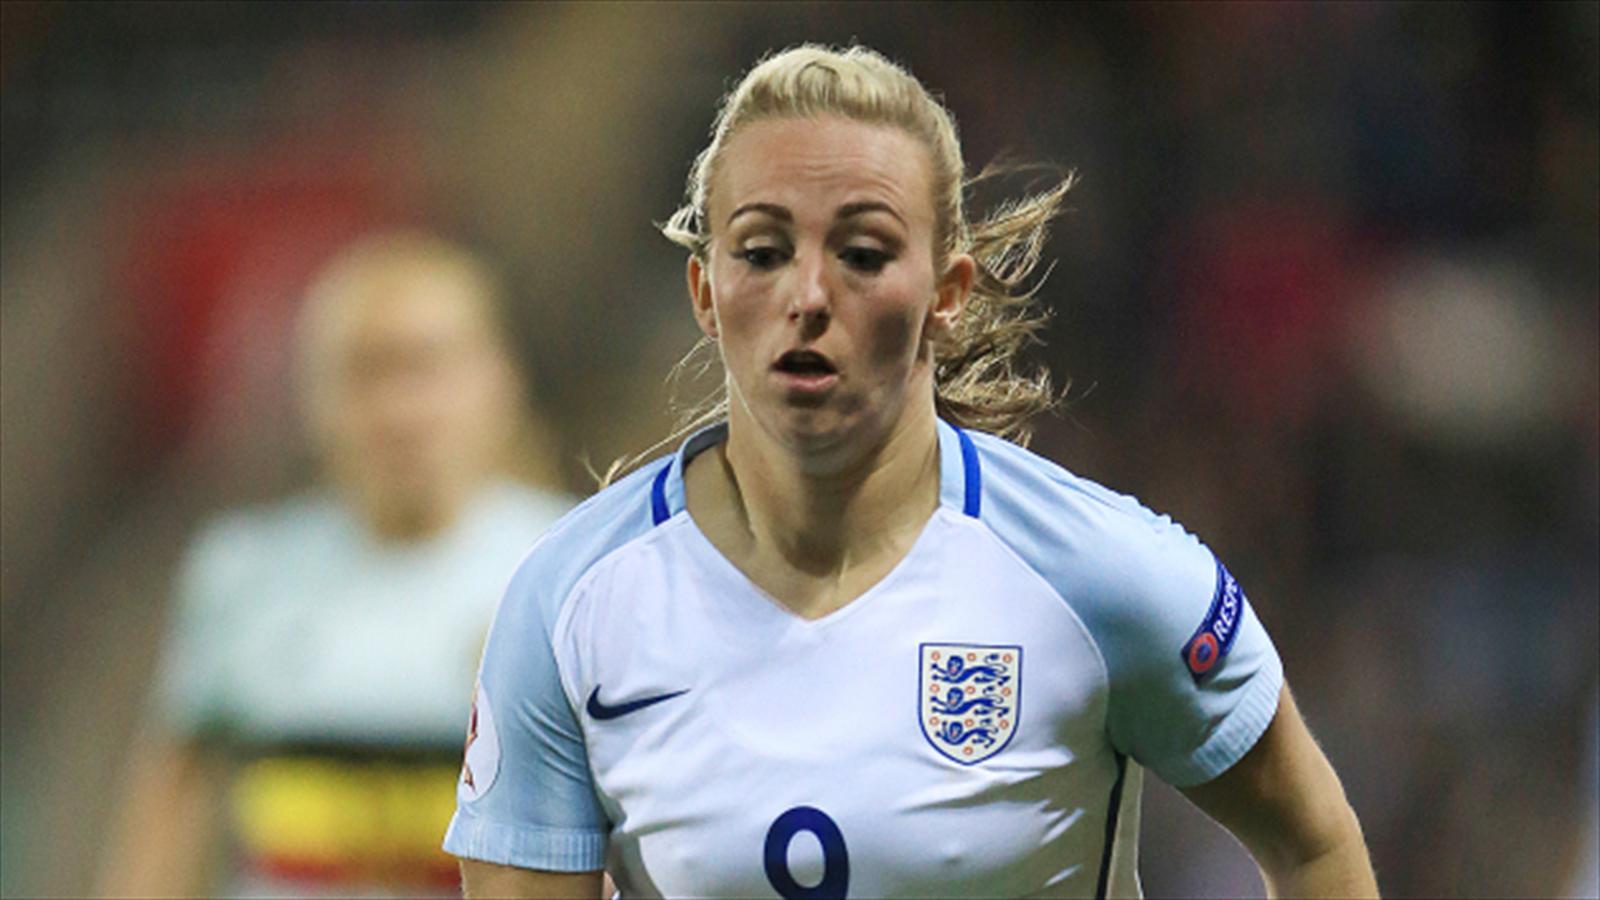 Manchester City's Toni Duggan recalled to England squad - Football - Eurosport Asia